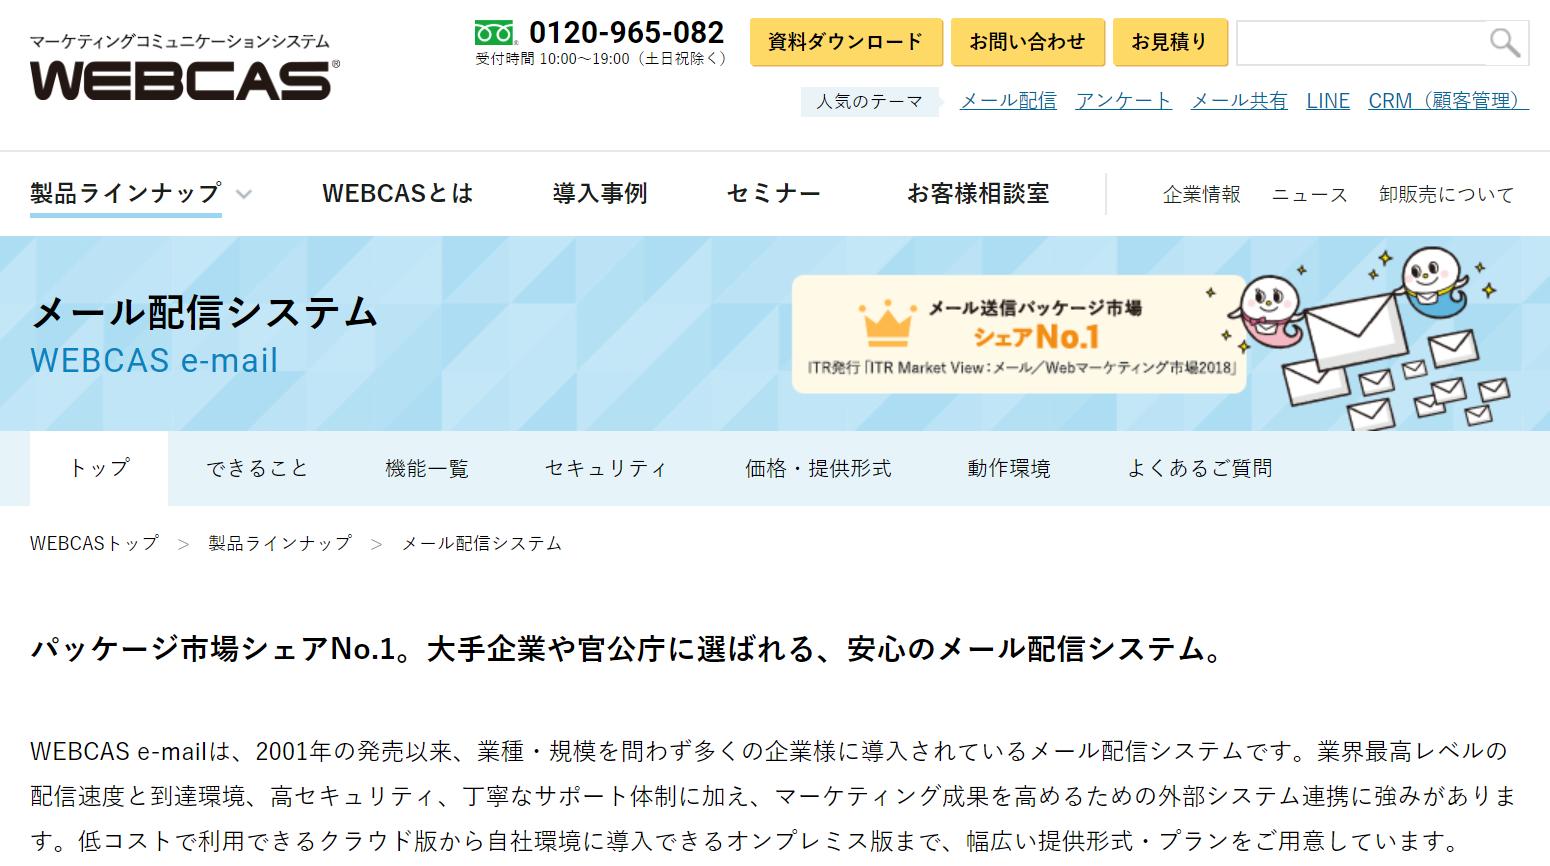 WEBCAS e-mail 公式Webサイト